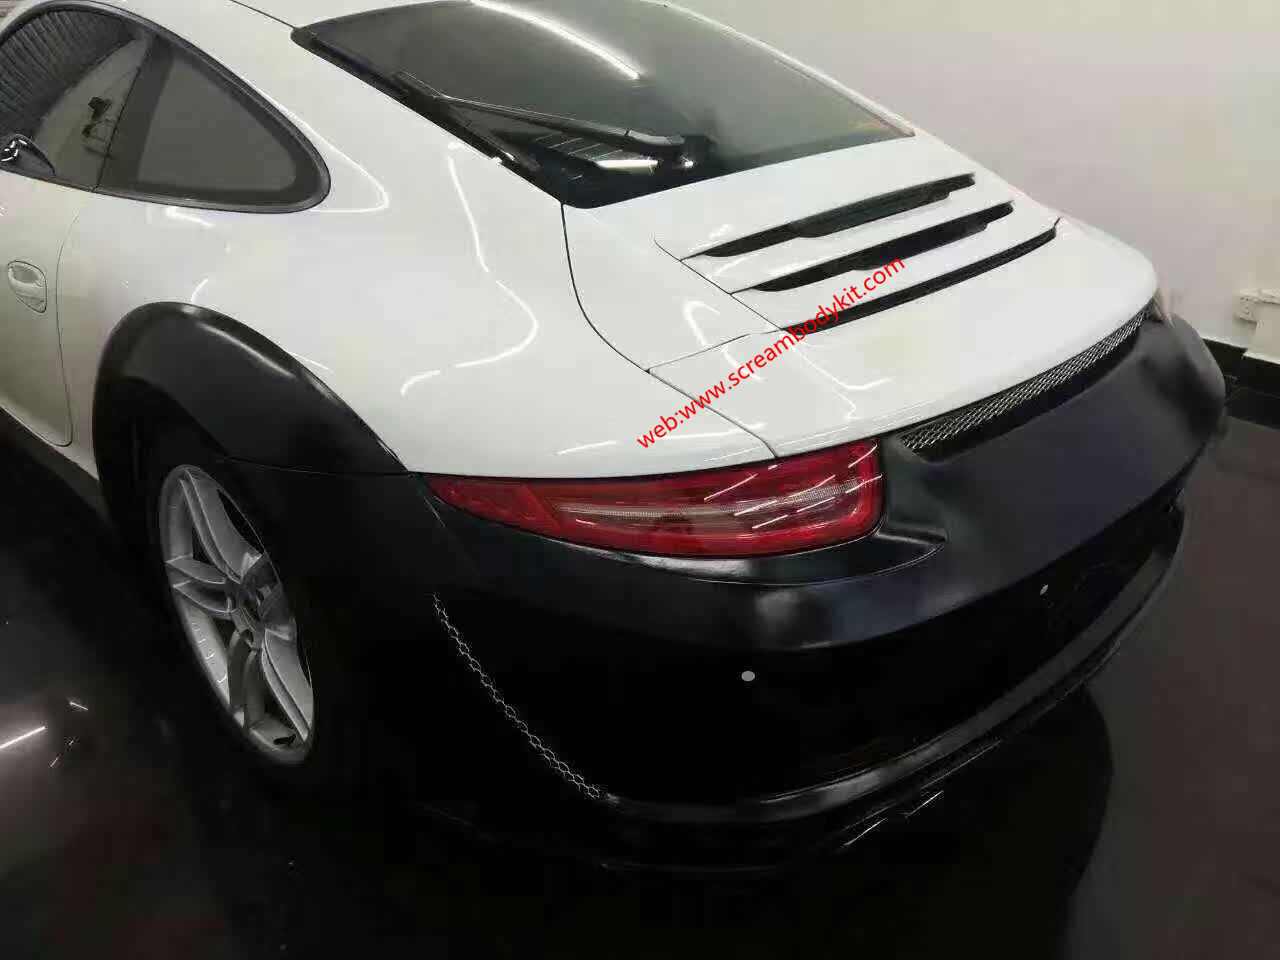 porsche 911 991 update Topcar wide body kit front bumper after bumper side skirts hood rear spoiler fenders